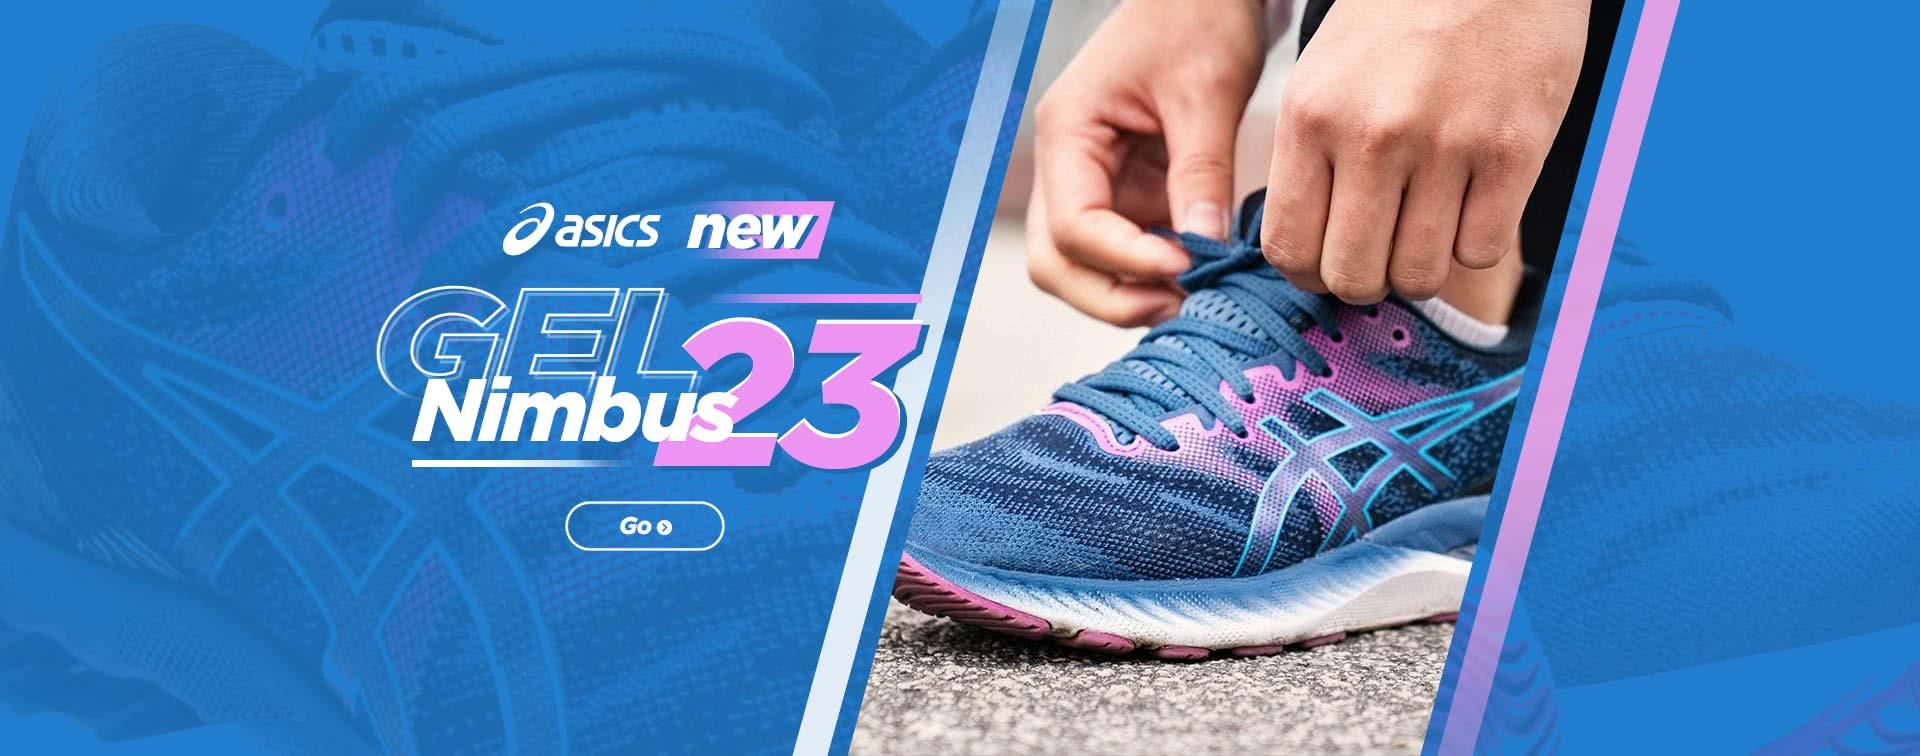 The new Asics Gel Nimbus 23